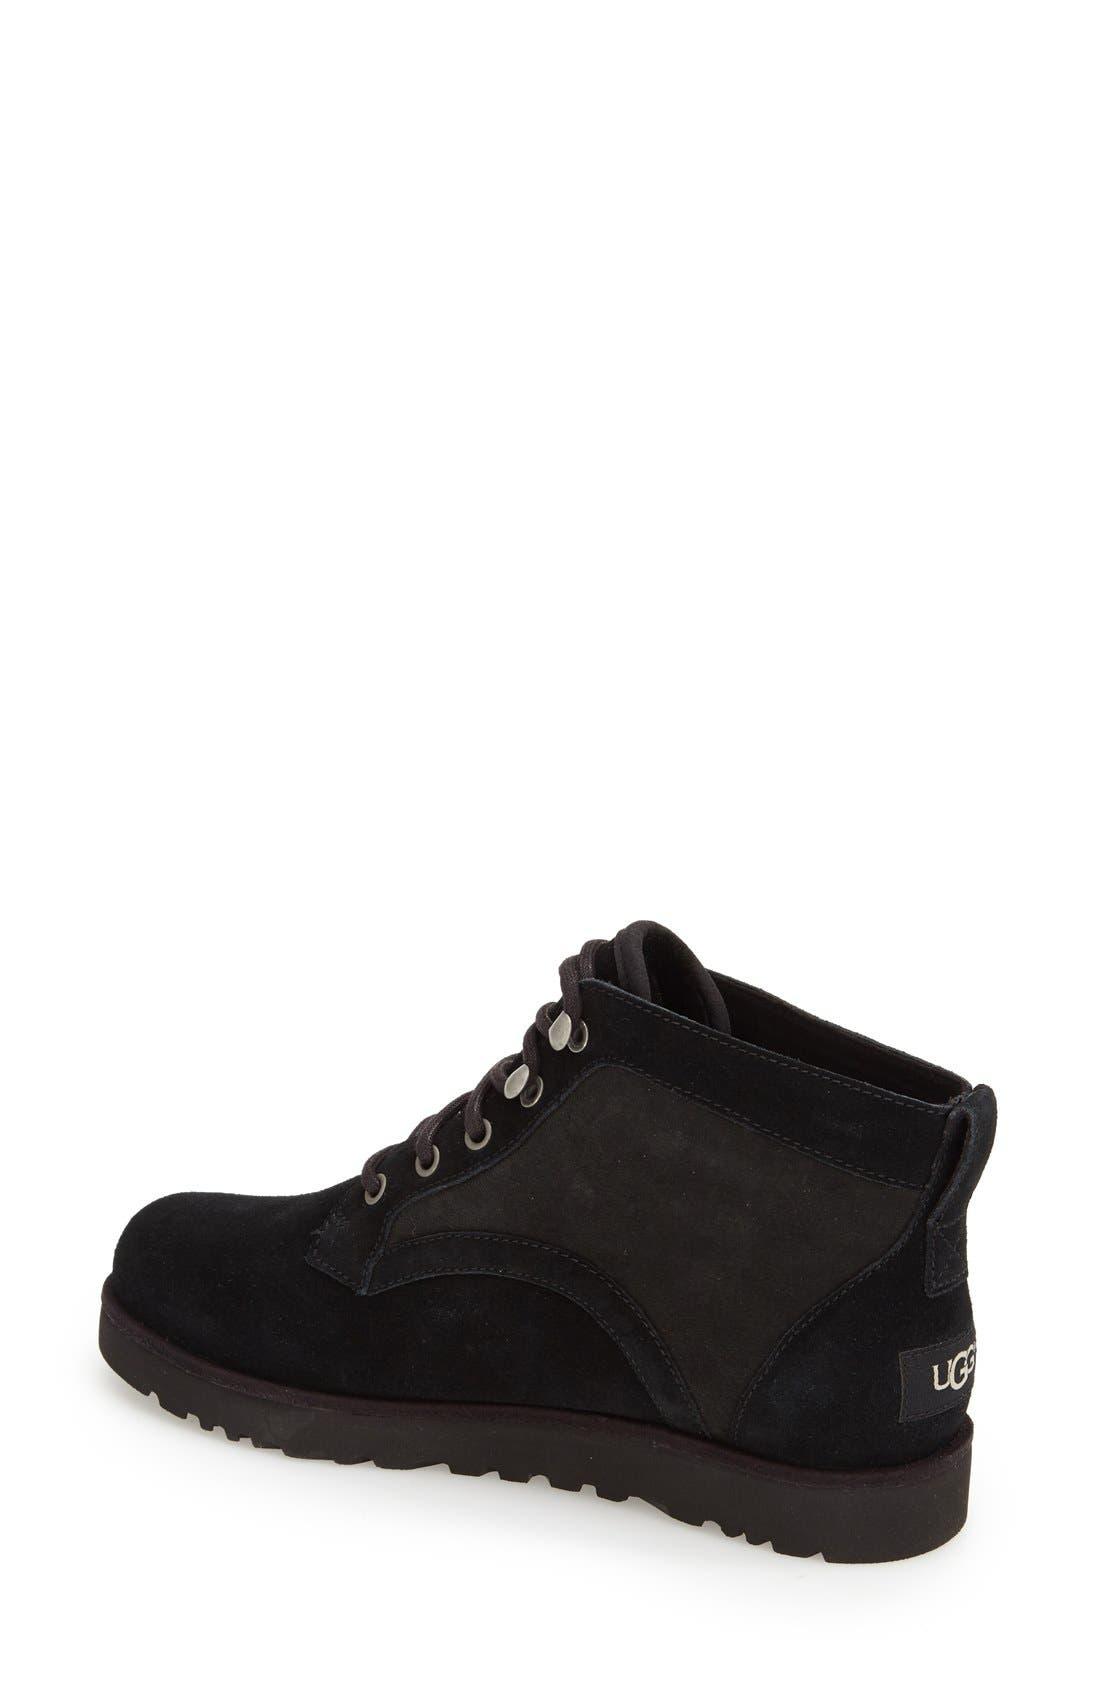 Alternate Image 2  - UGG® Bethany - Classic Slim™ Water Resistant Chukka Boot (Women)